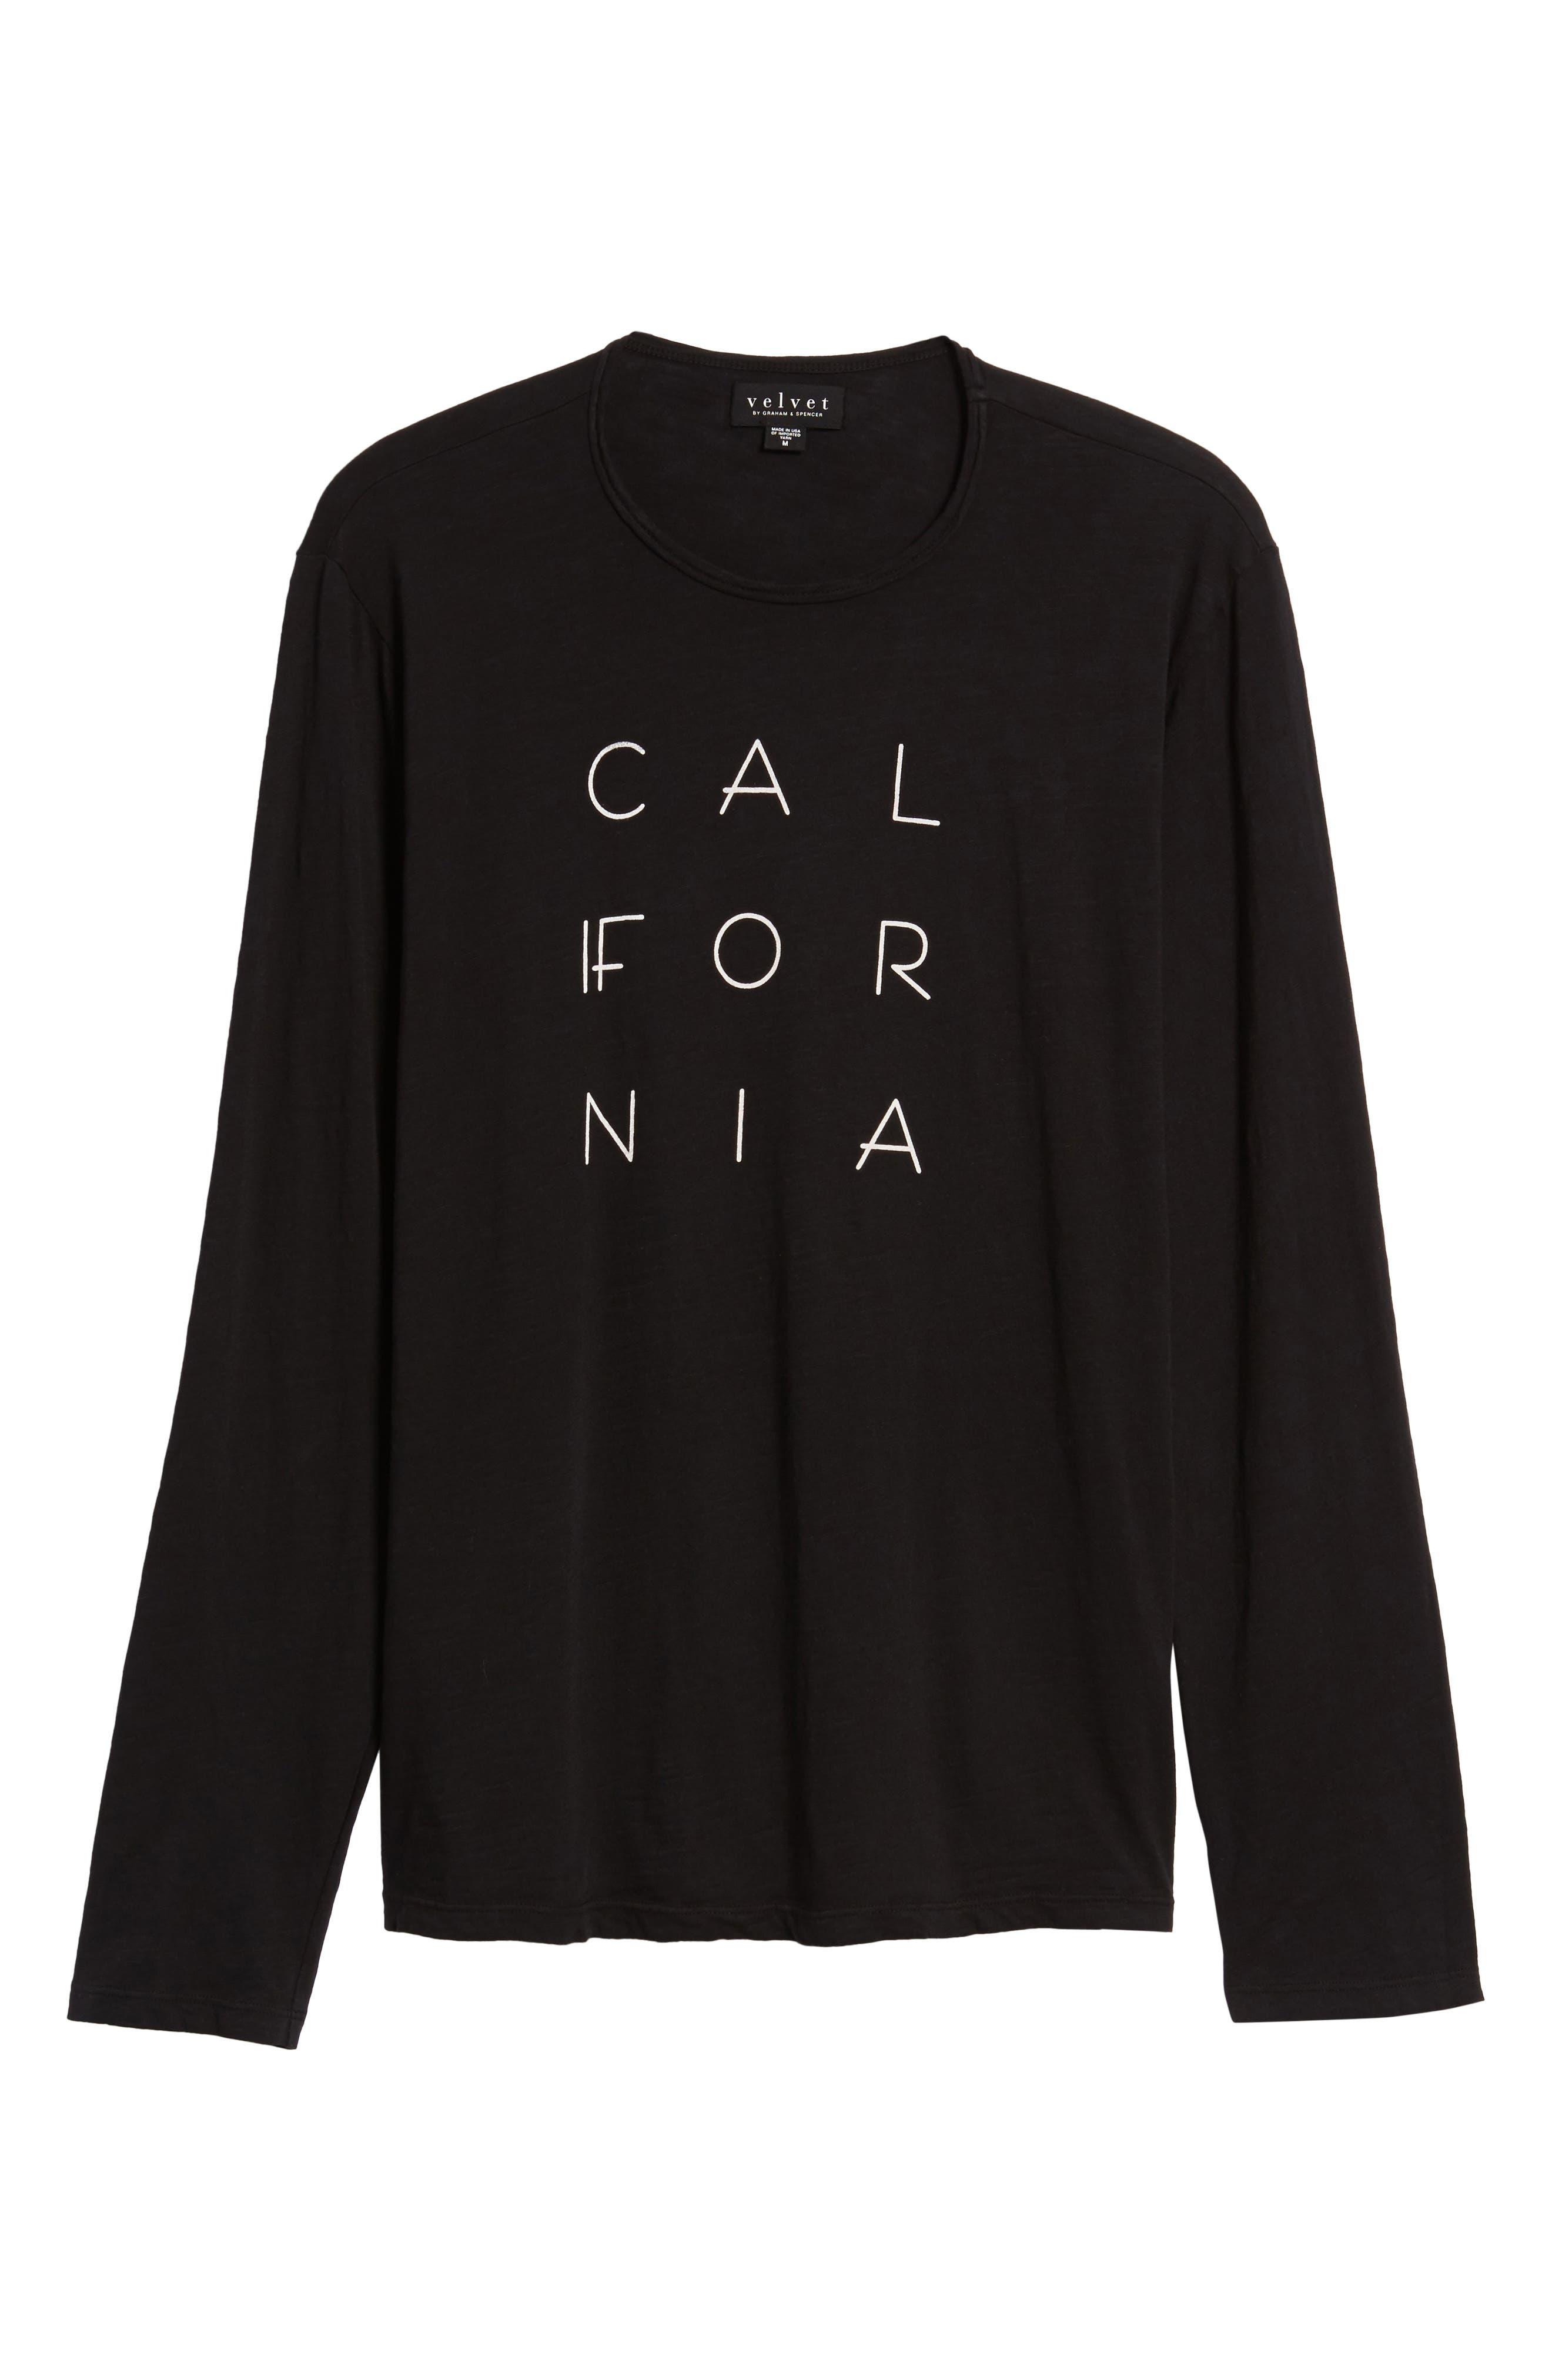 California Graphic Long-Sleeve T-Shirt,                             Alternate thumbnail 6, color,                             001